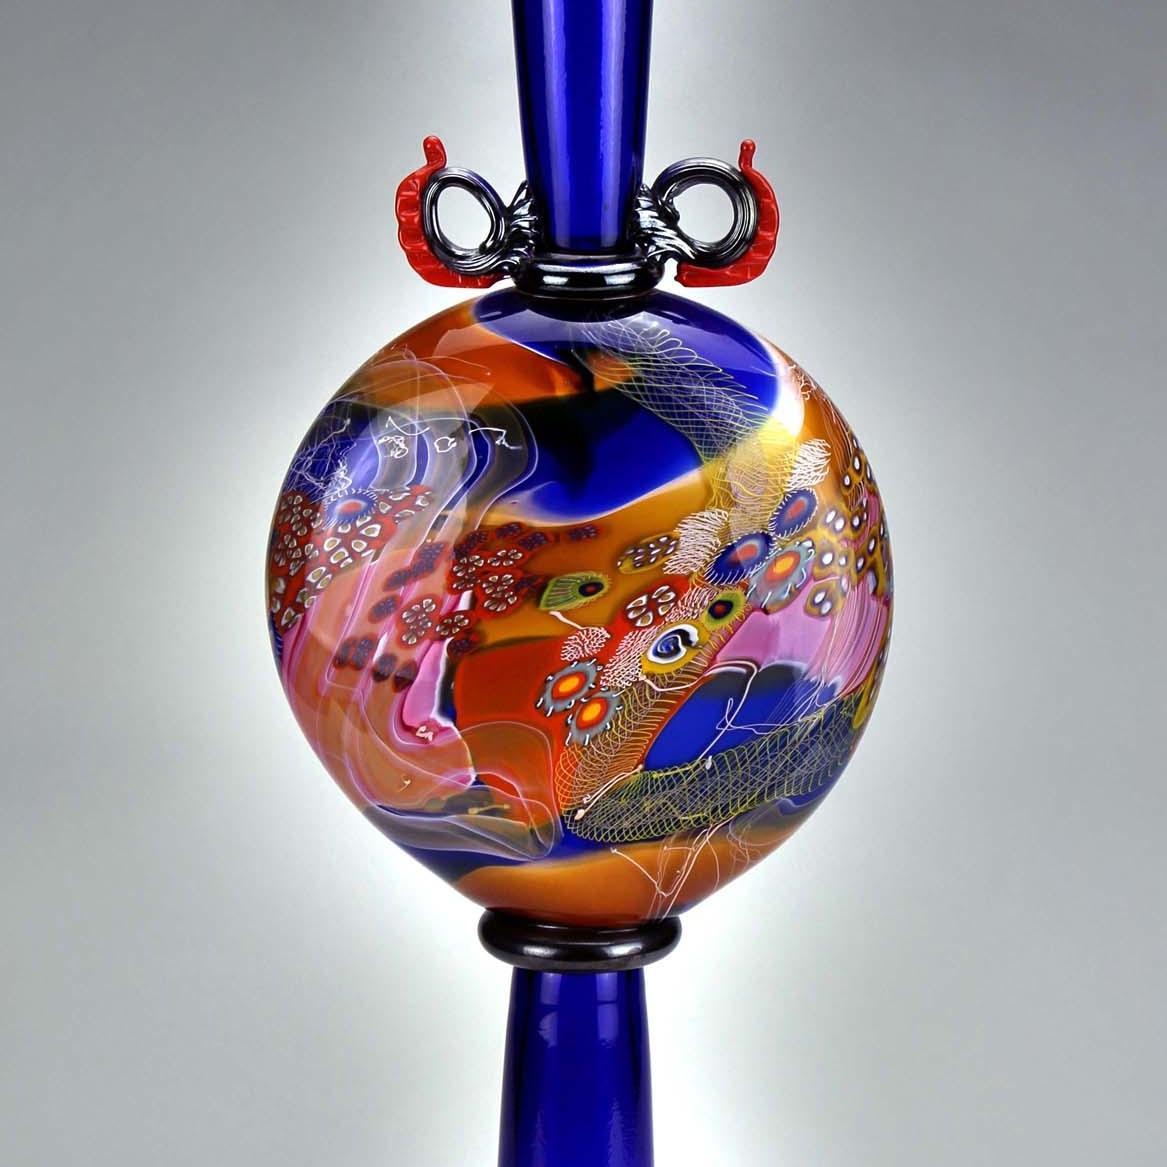 Colorfield Amphora - Sleek and Slender